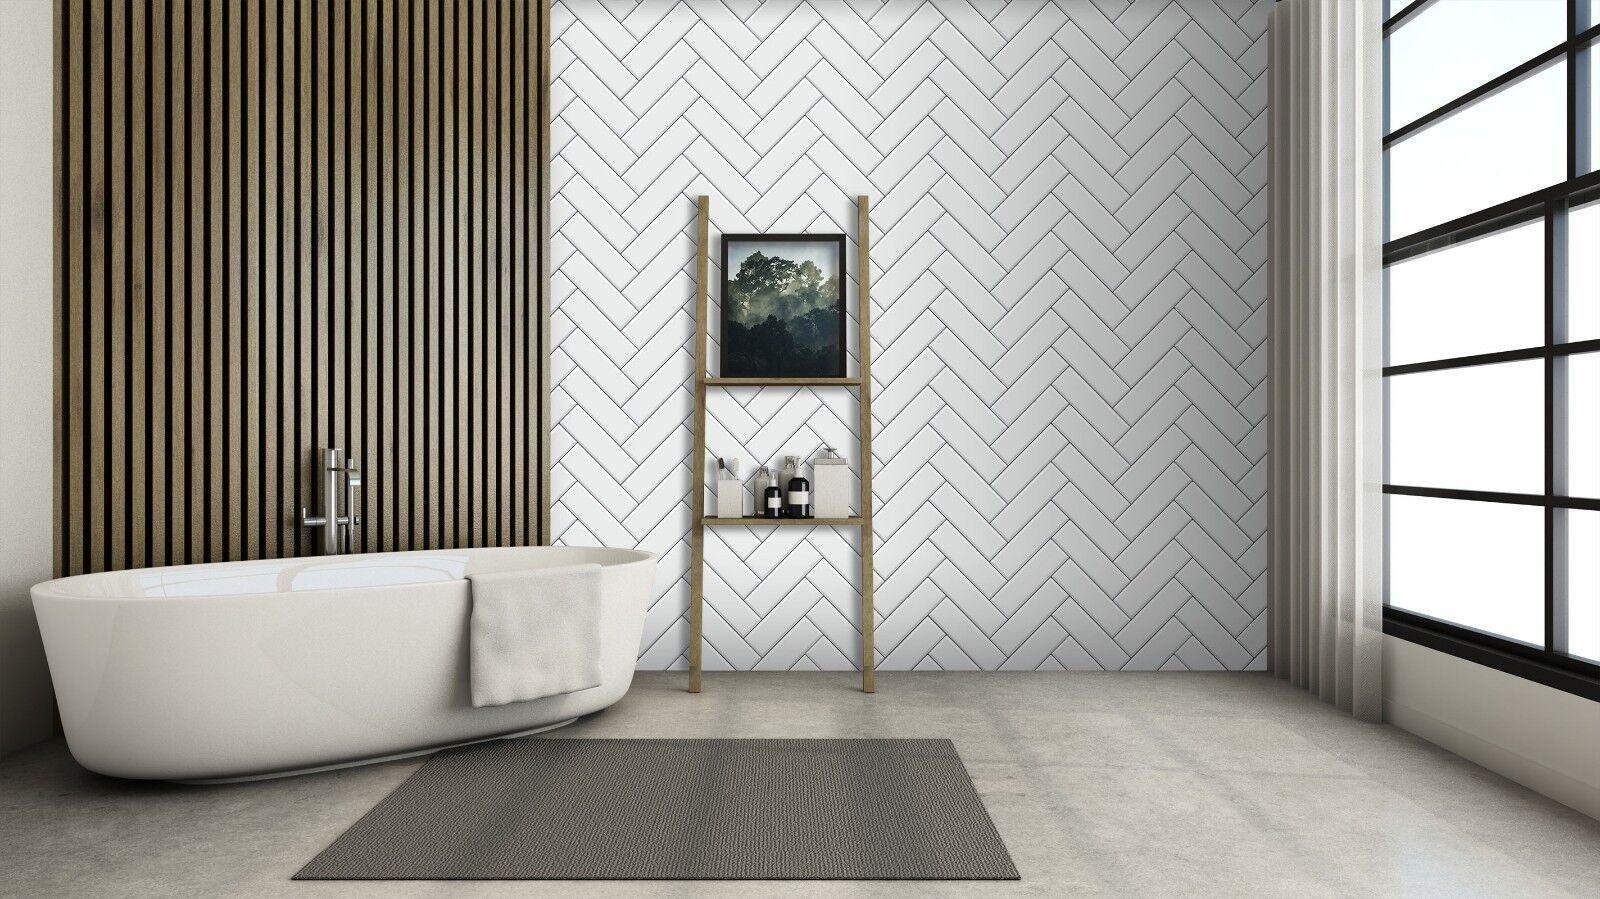 3D Kreuz Ziegel Wave 78 Textur Fliesen Marmor Tapeten Abziehbild Tapete Wandbild